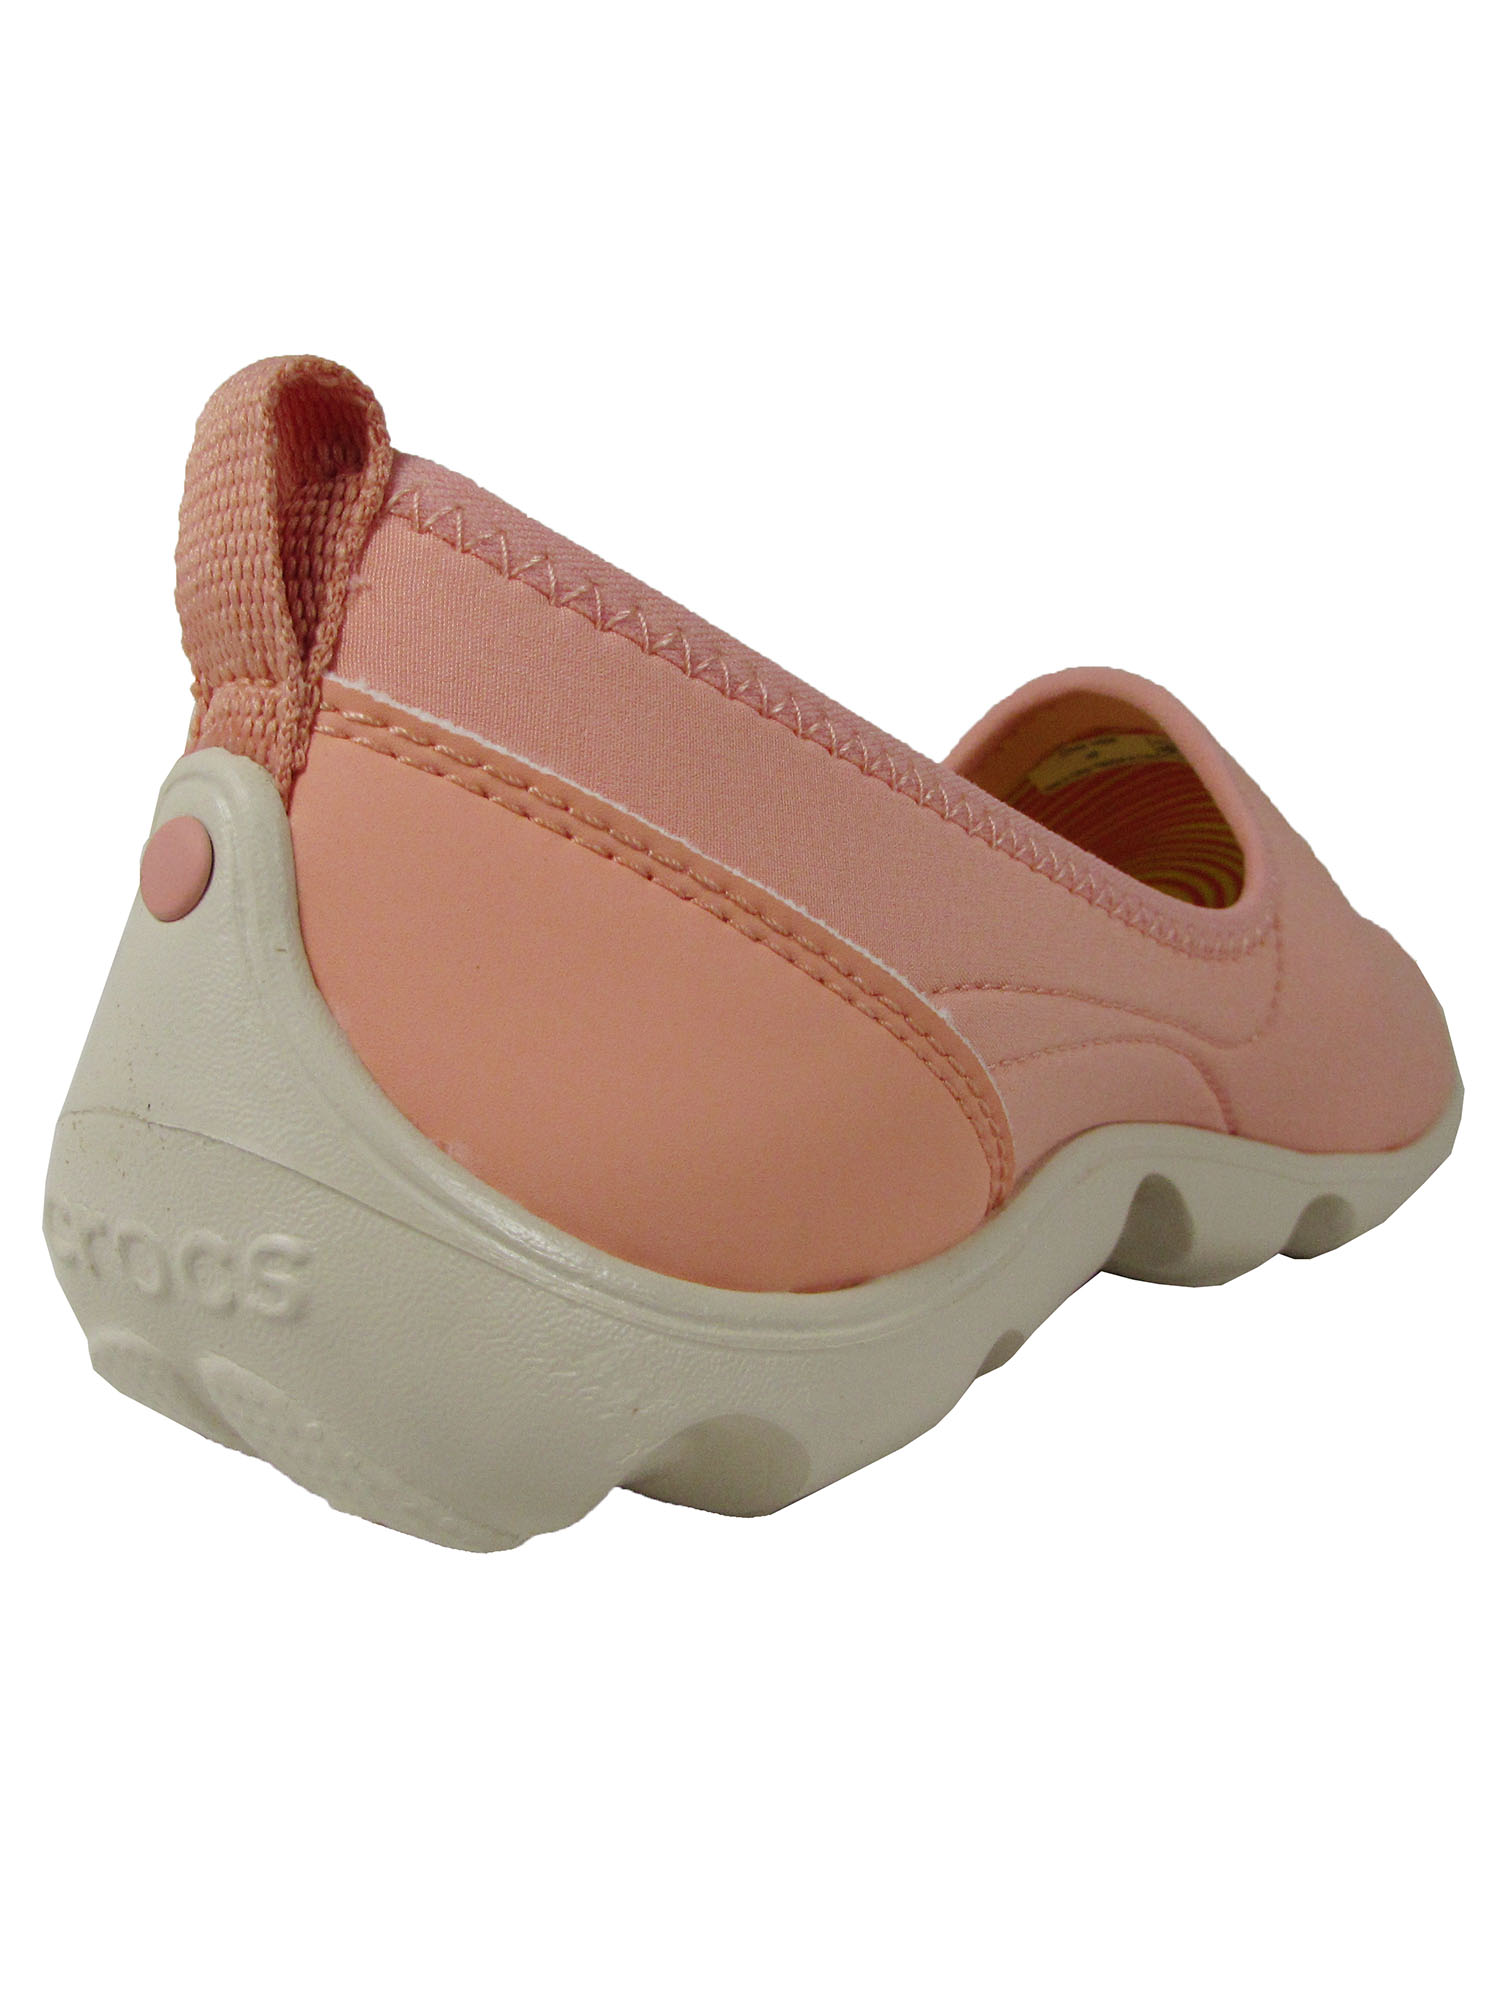 Crocs-Womens-Duet-Busy-Day-Skimmer-Flat-Shoes thumbnail 13